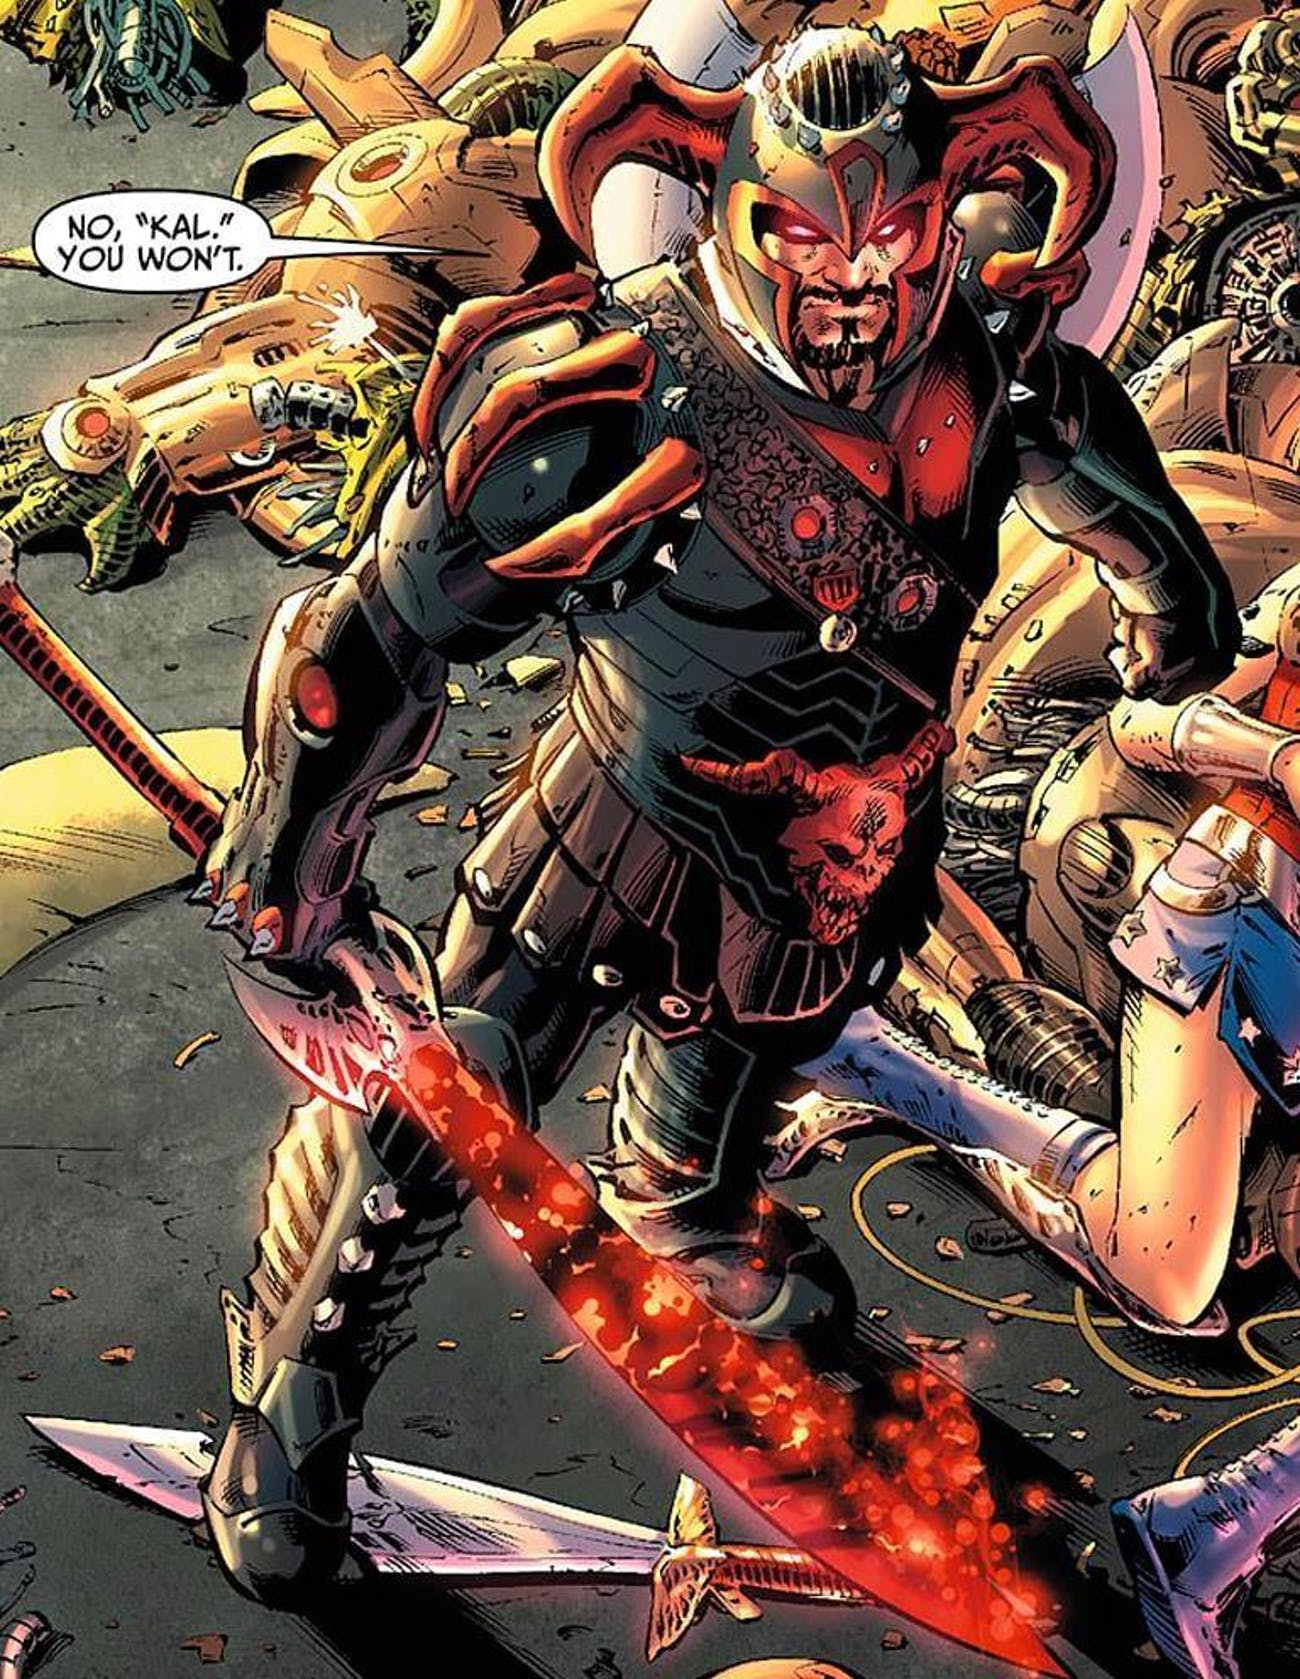 Darkseid general